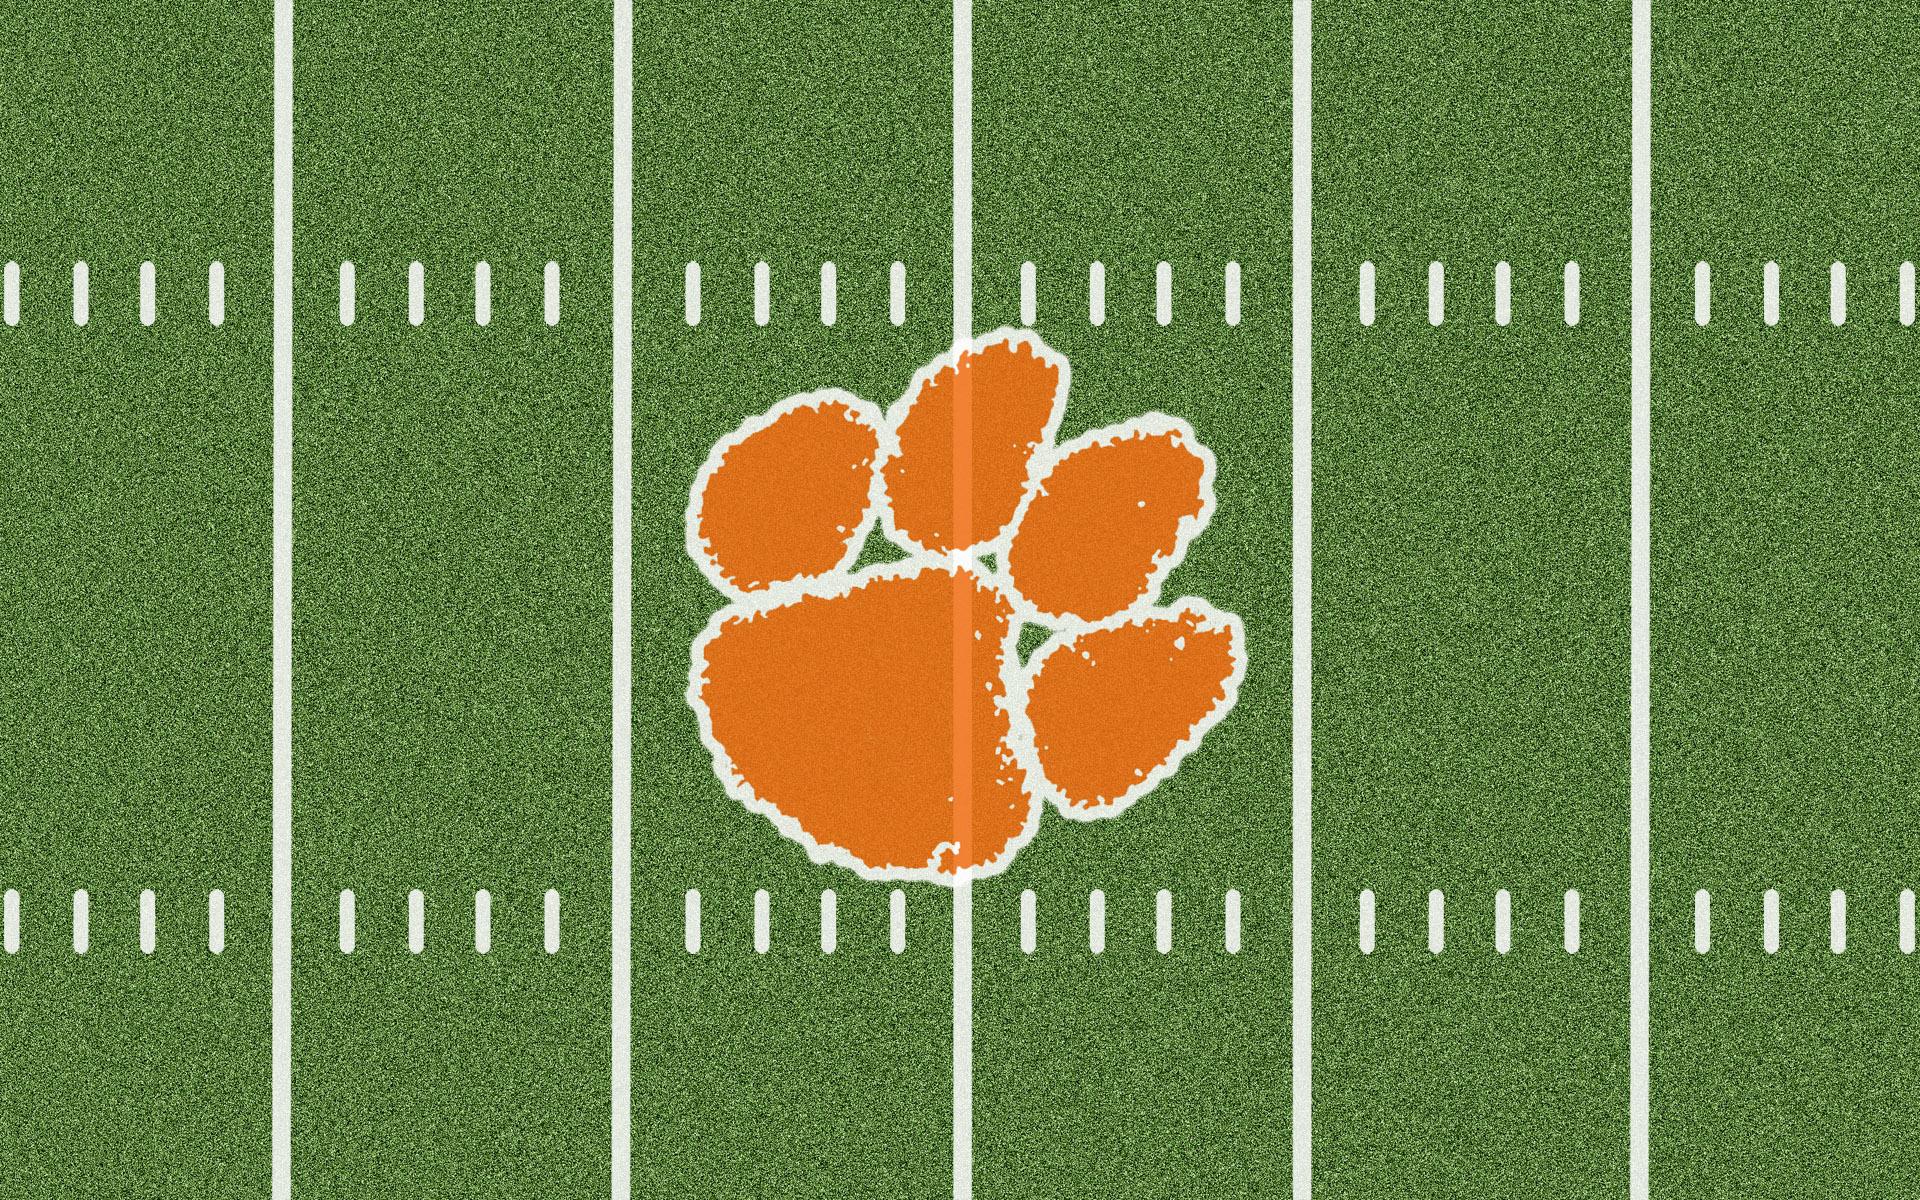 Clemson Tigers Iphone Wallpaper Clemson Tigers Wallpapers Hd Pixelstalk Net